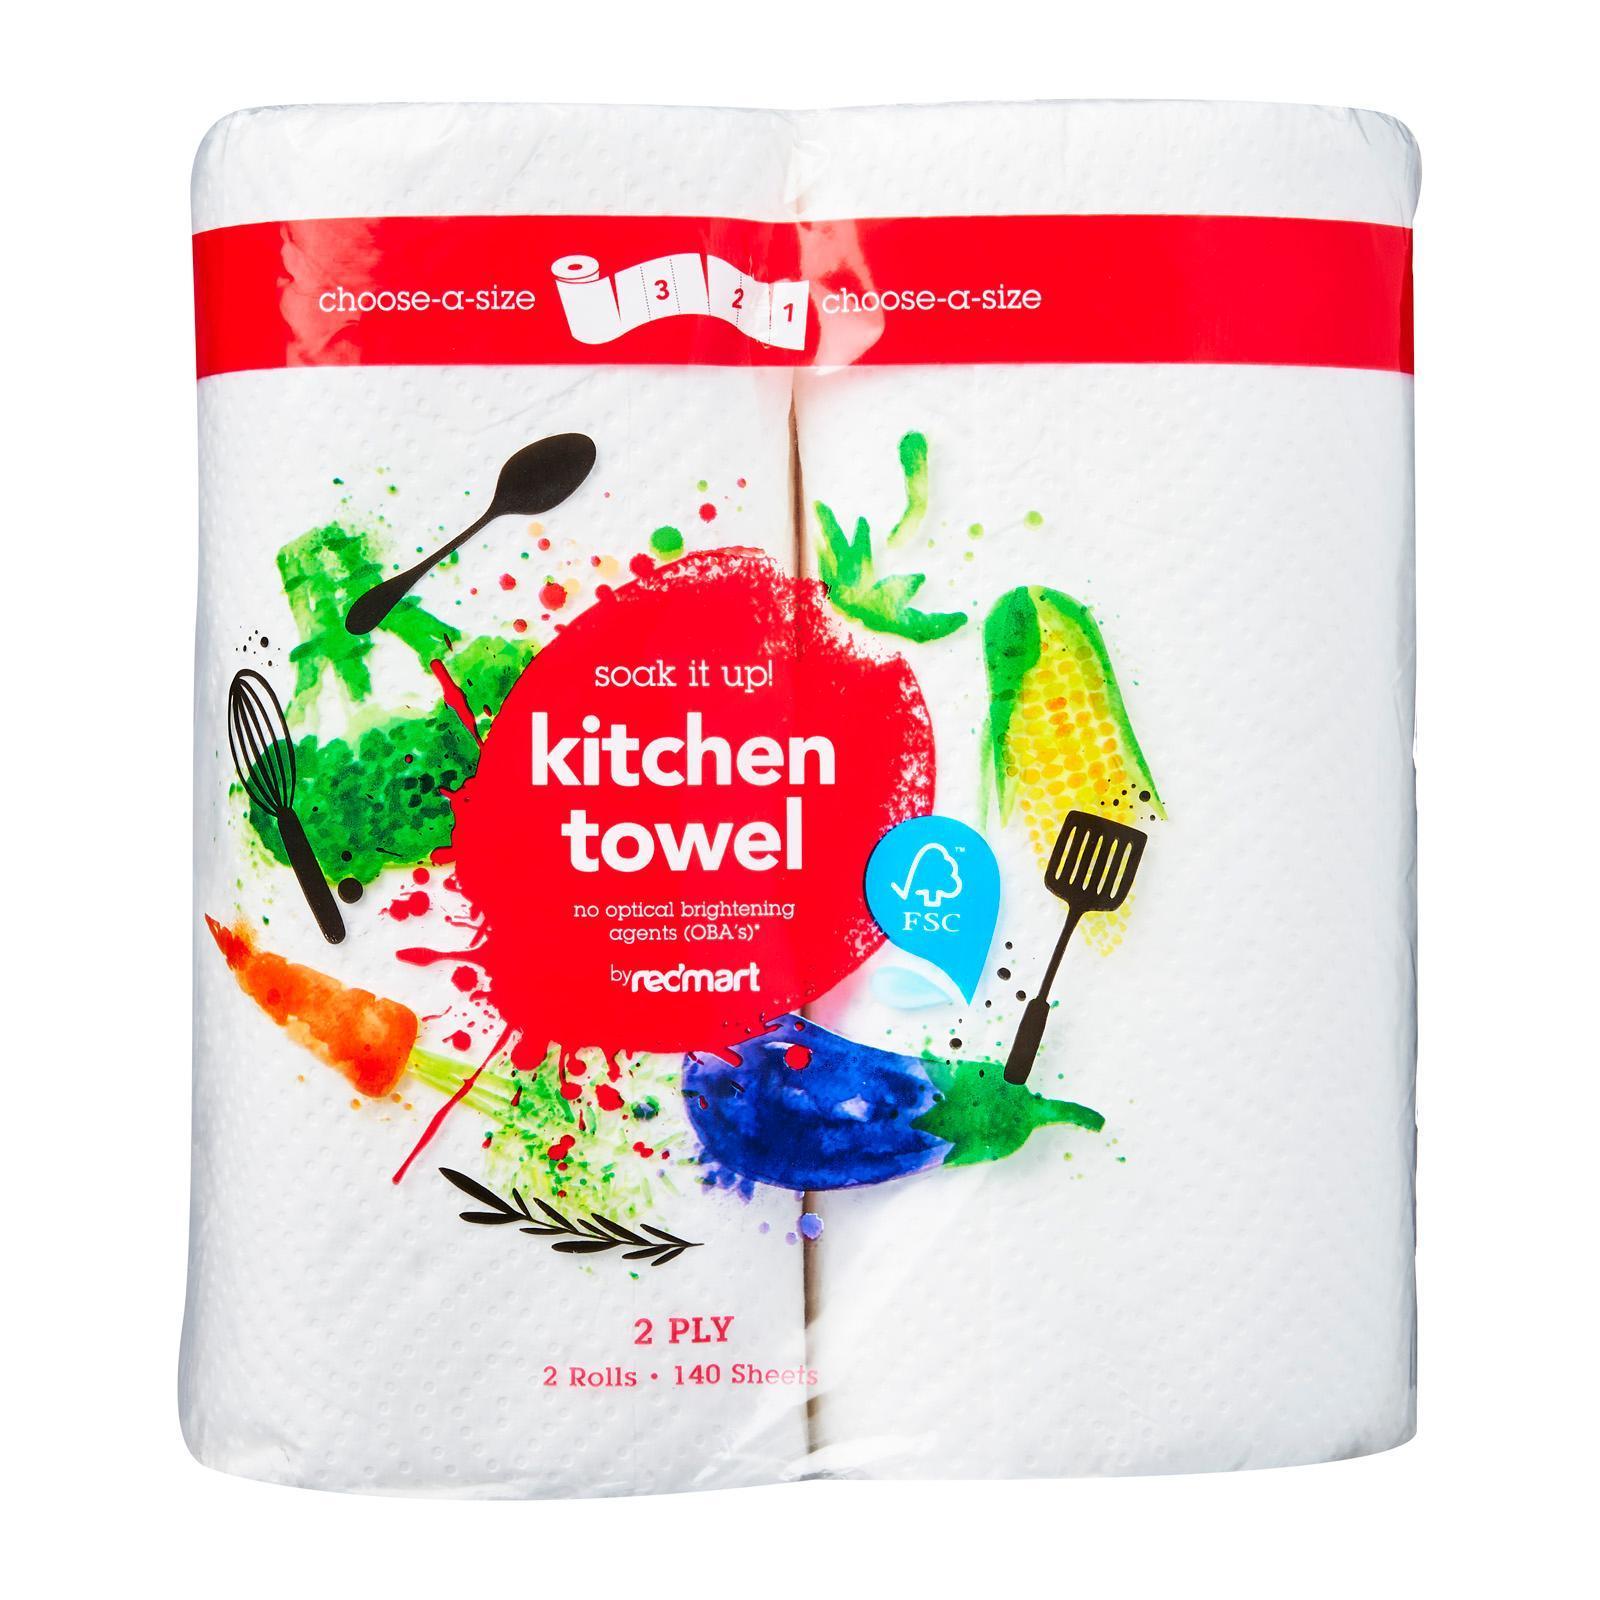 RedMart Kitchen Towel (Choose-A-Size)